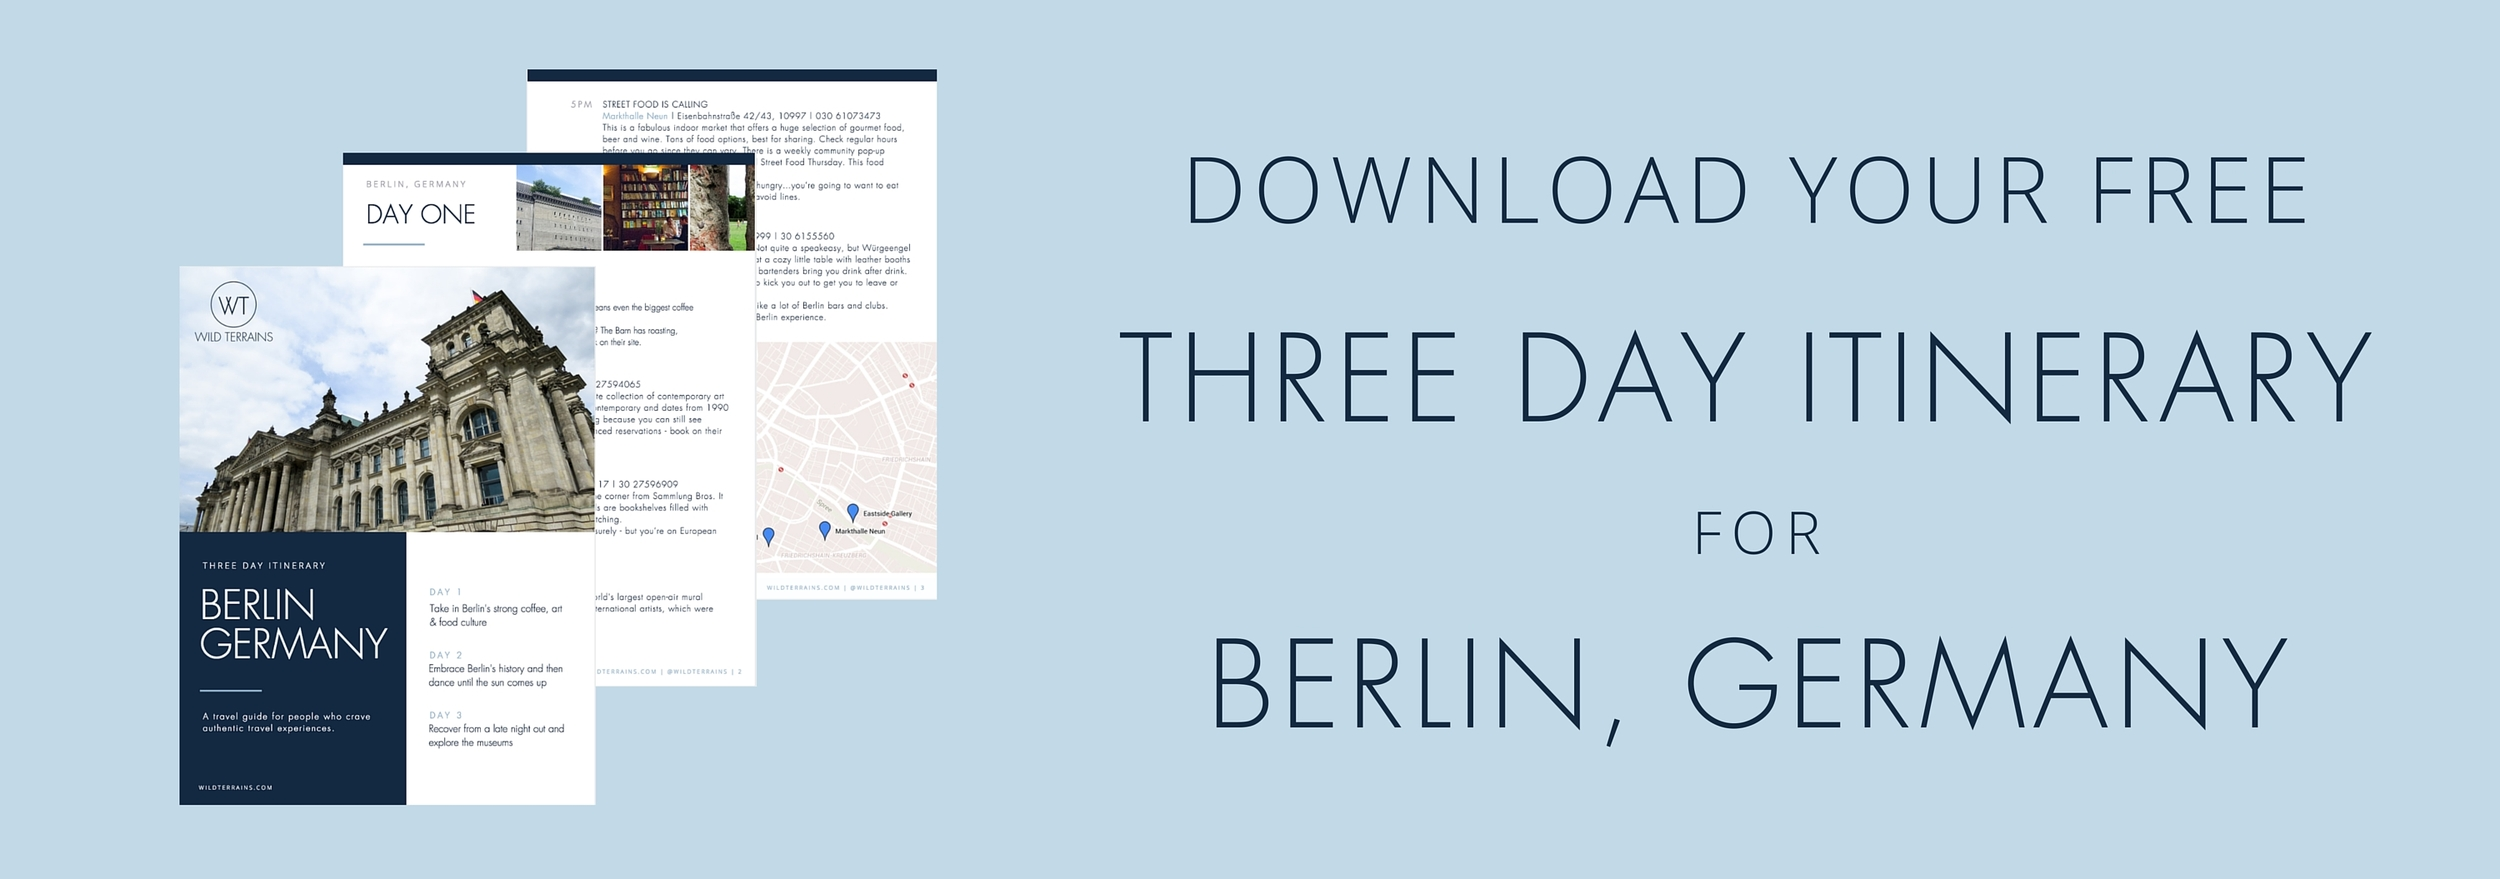 three-day-itinerary-berlin